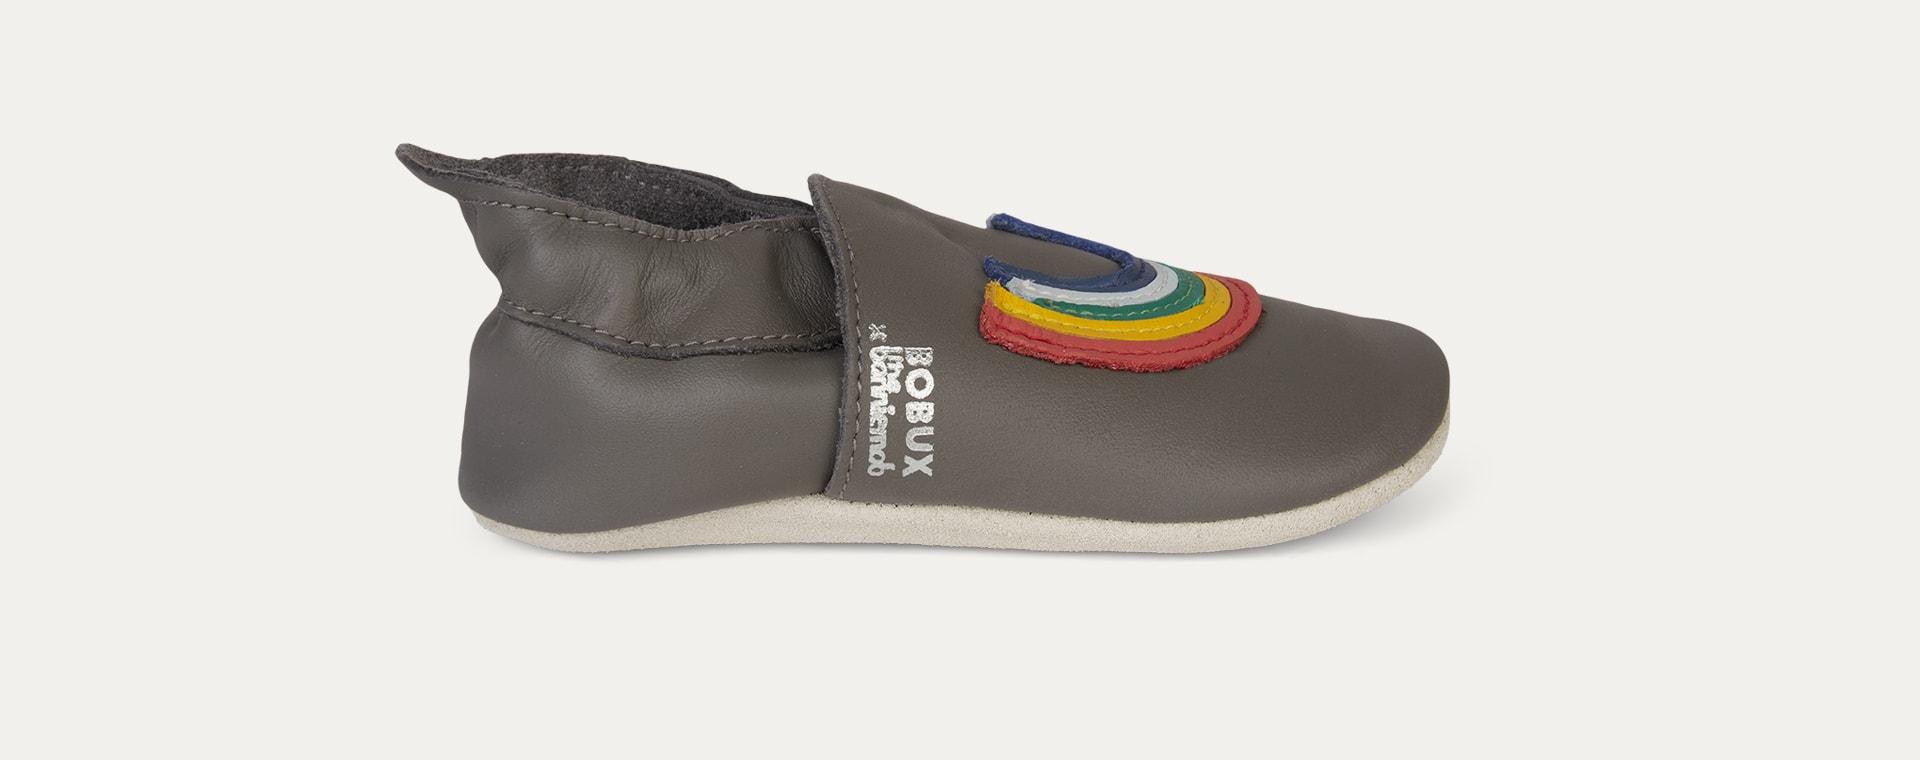 Imagine Rainbow Bobux Bobux x The Bonnie Mob Soft Soles